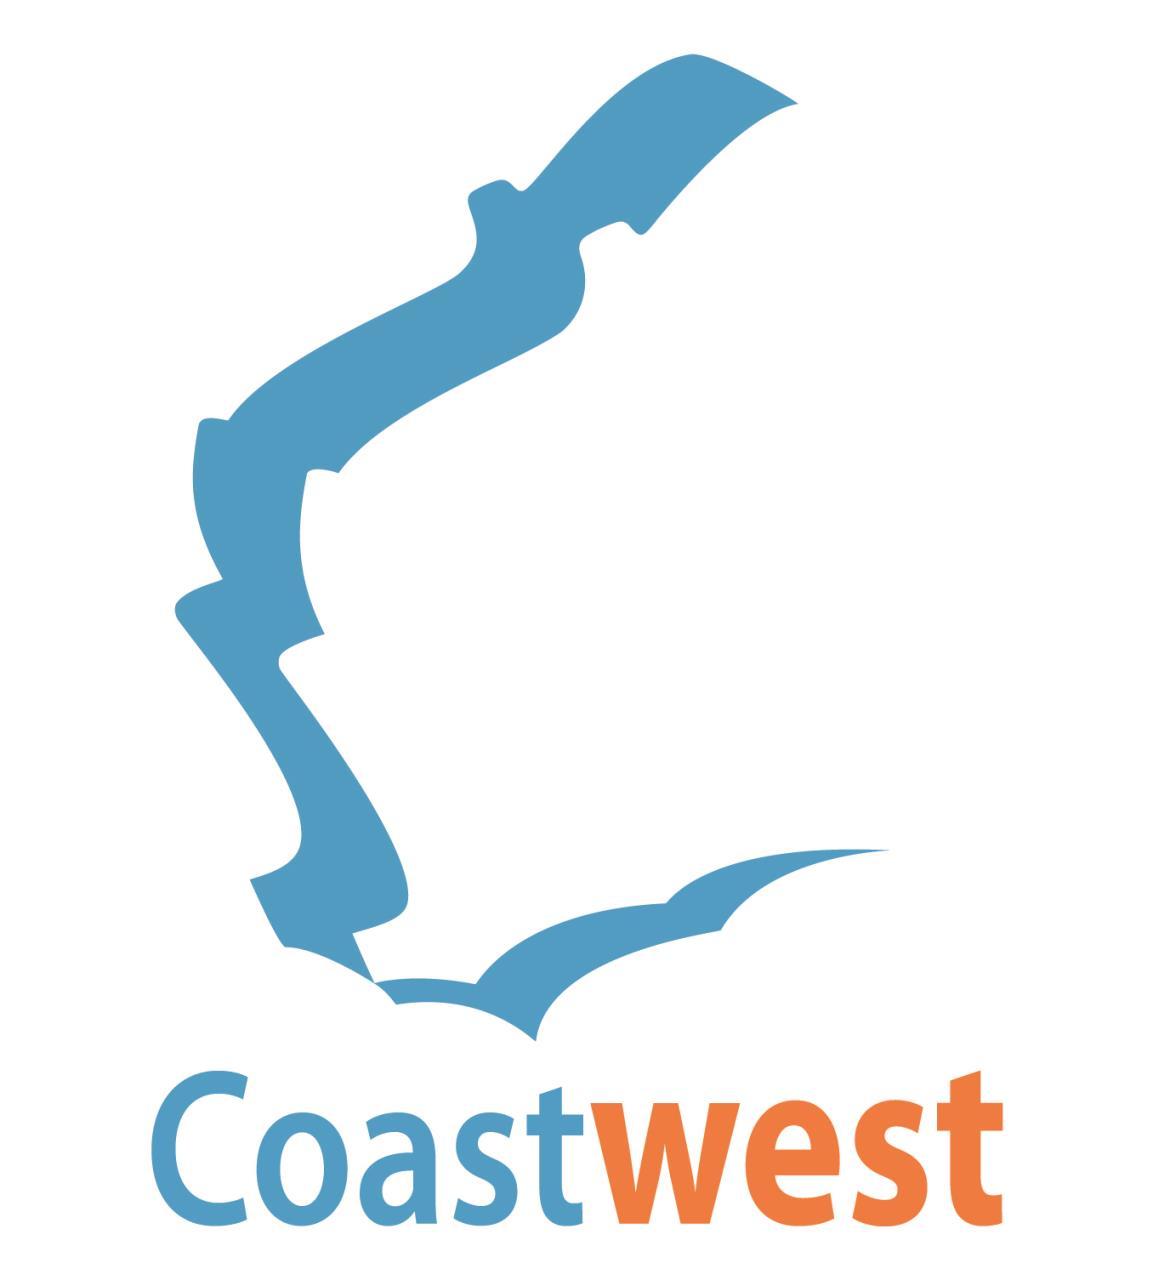 Coastwest.jpg